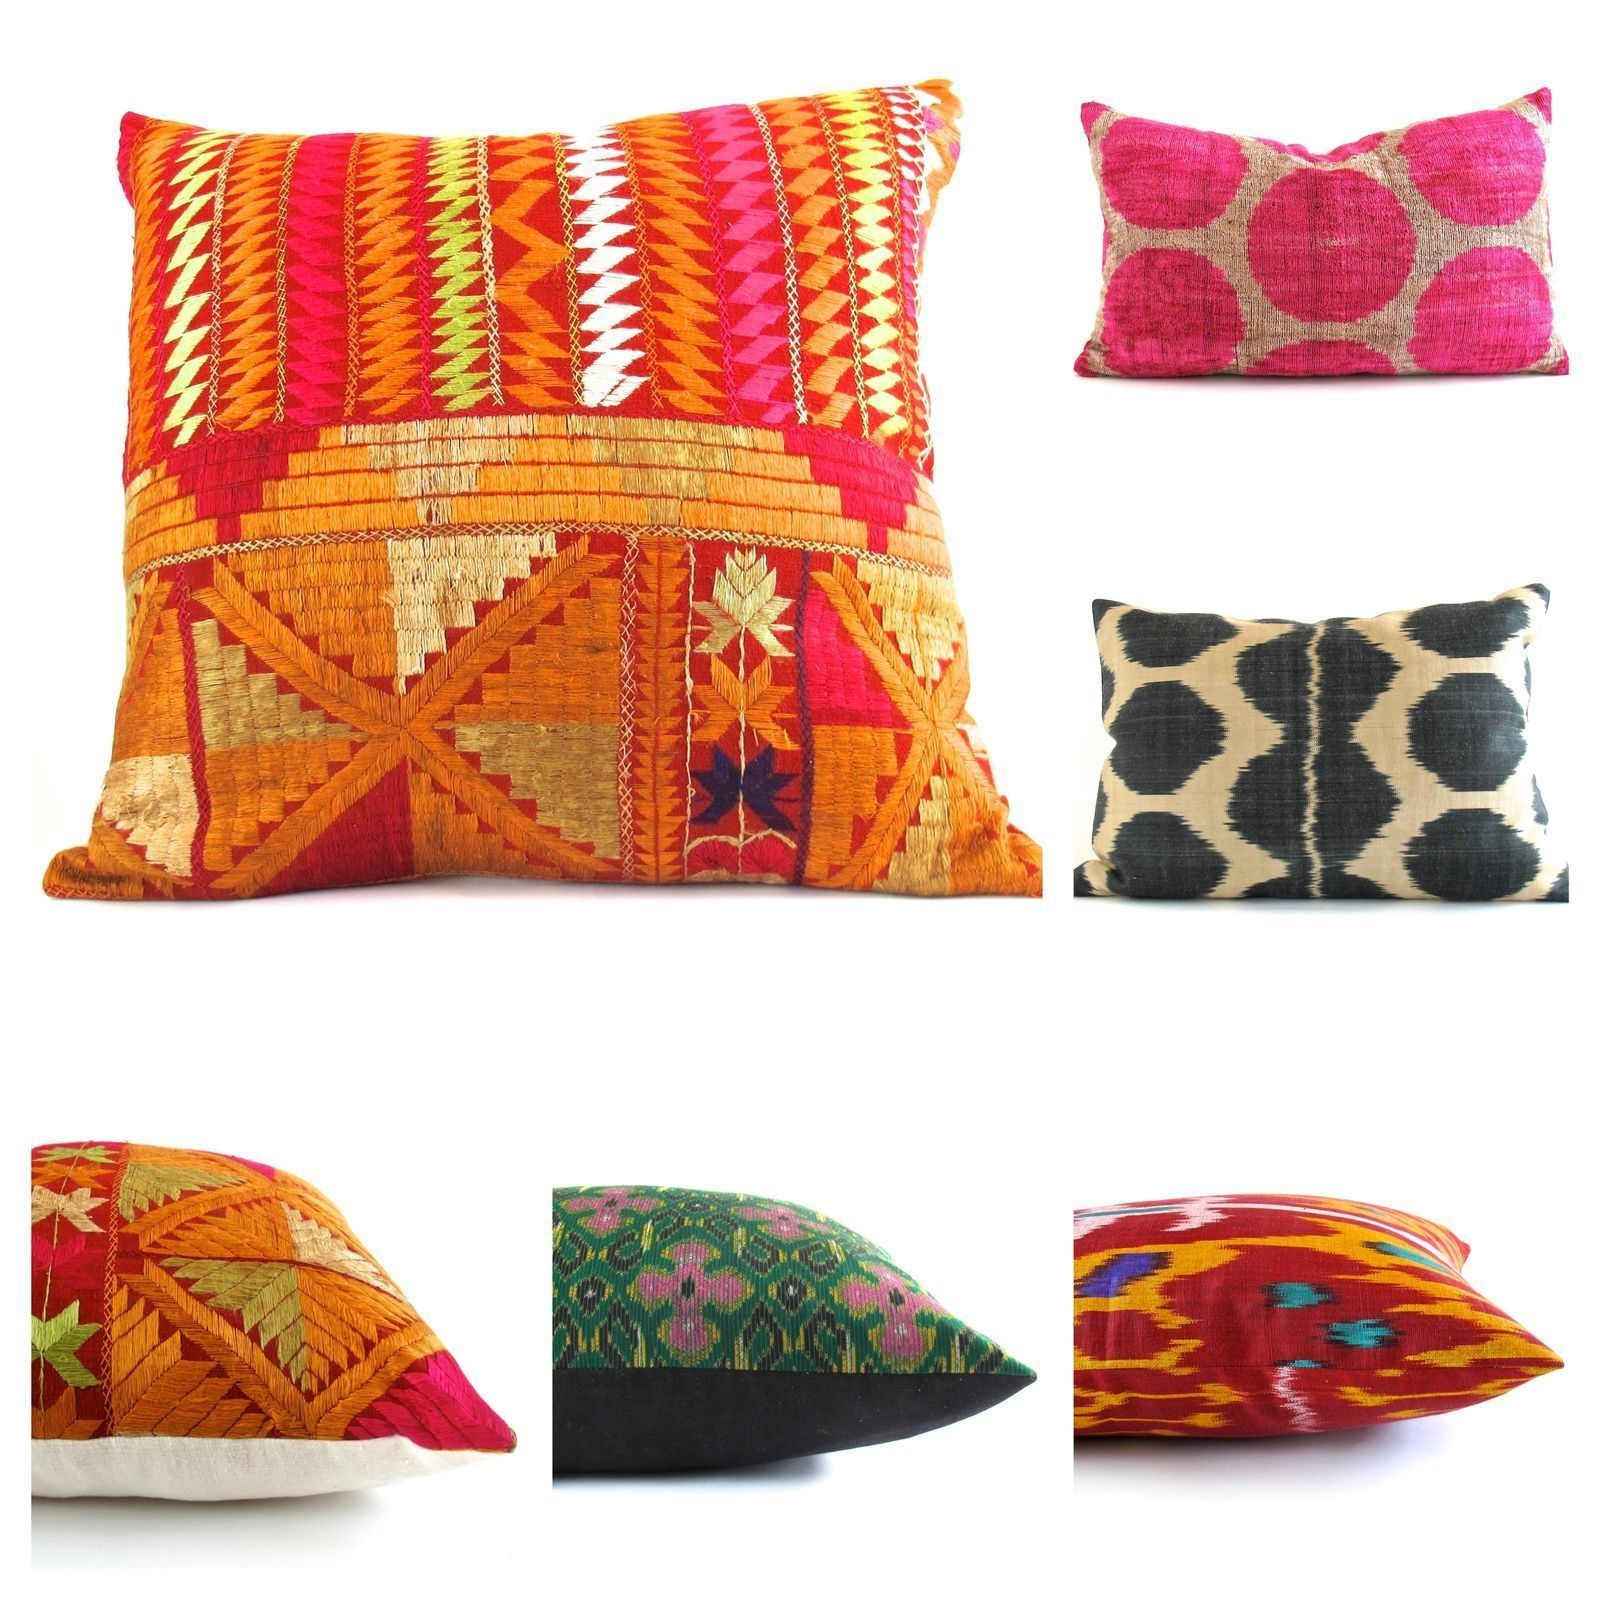 Saturday Pillow Play Phulkari Ikat India Thailand Uzbekistan Theworld Pillows Theloadedtrunk Textiles Pillows Throw Pillows Global Home